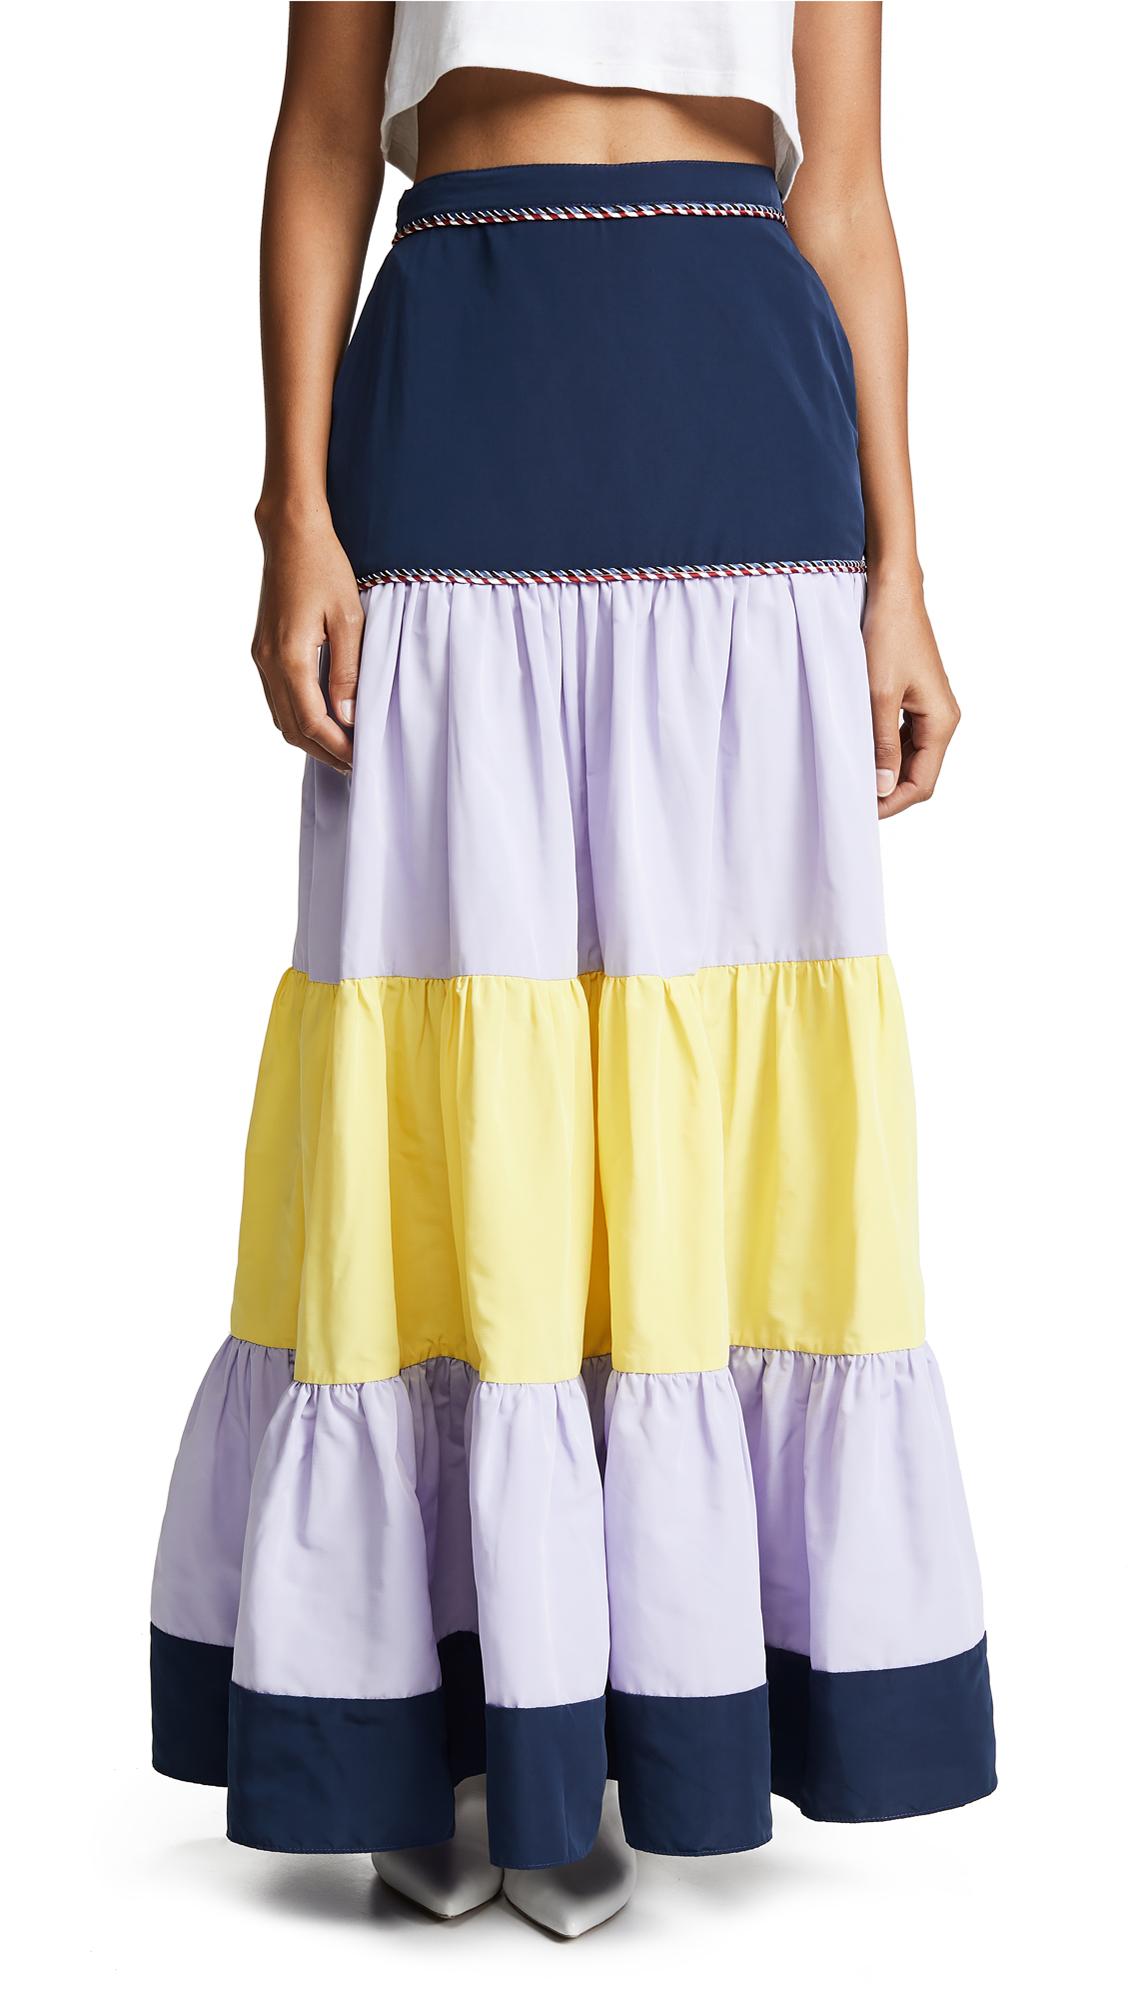 ZAYAN THE LABEL Rosie Skirt in Multicolor